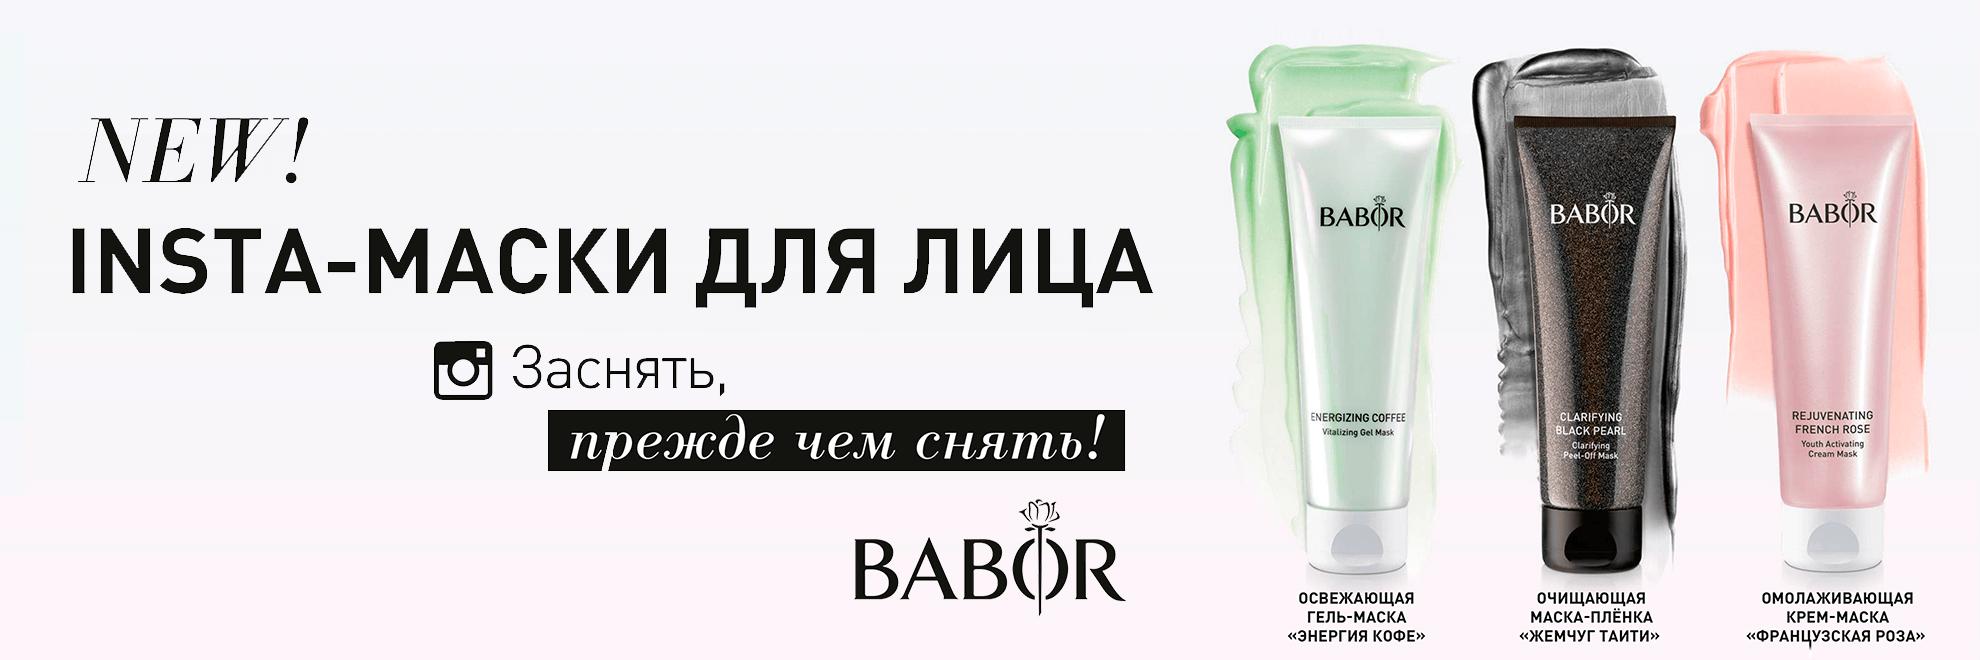 ТРИ МАСКИ BABOR